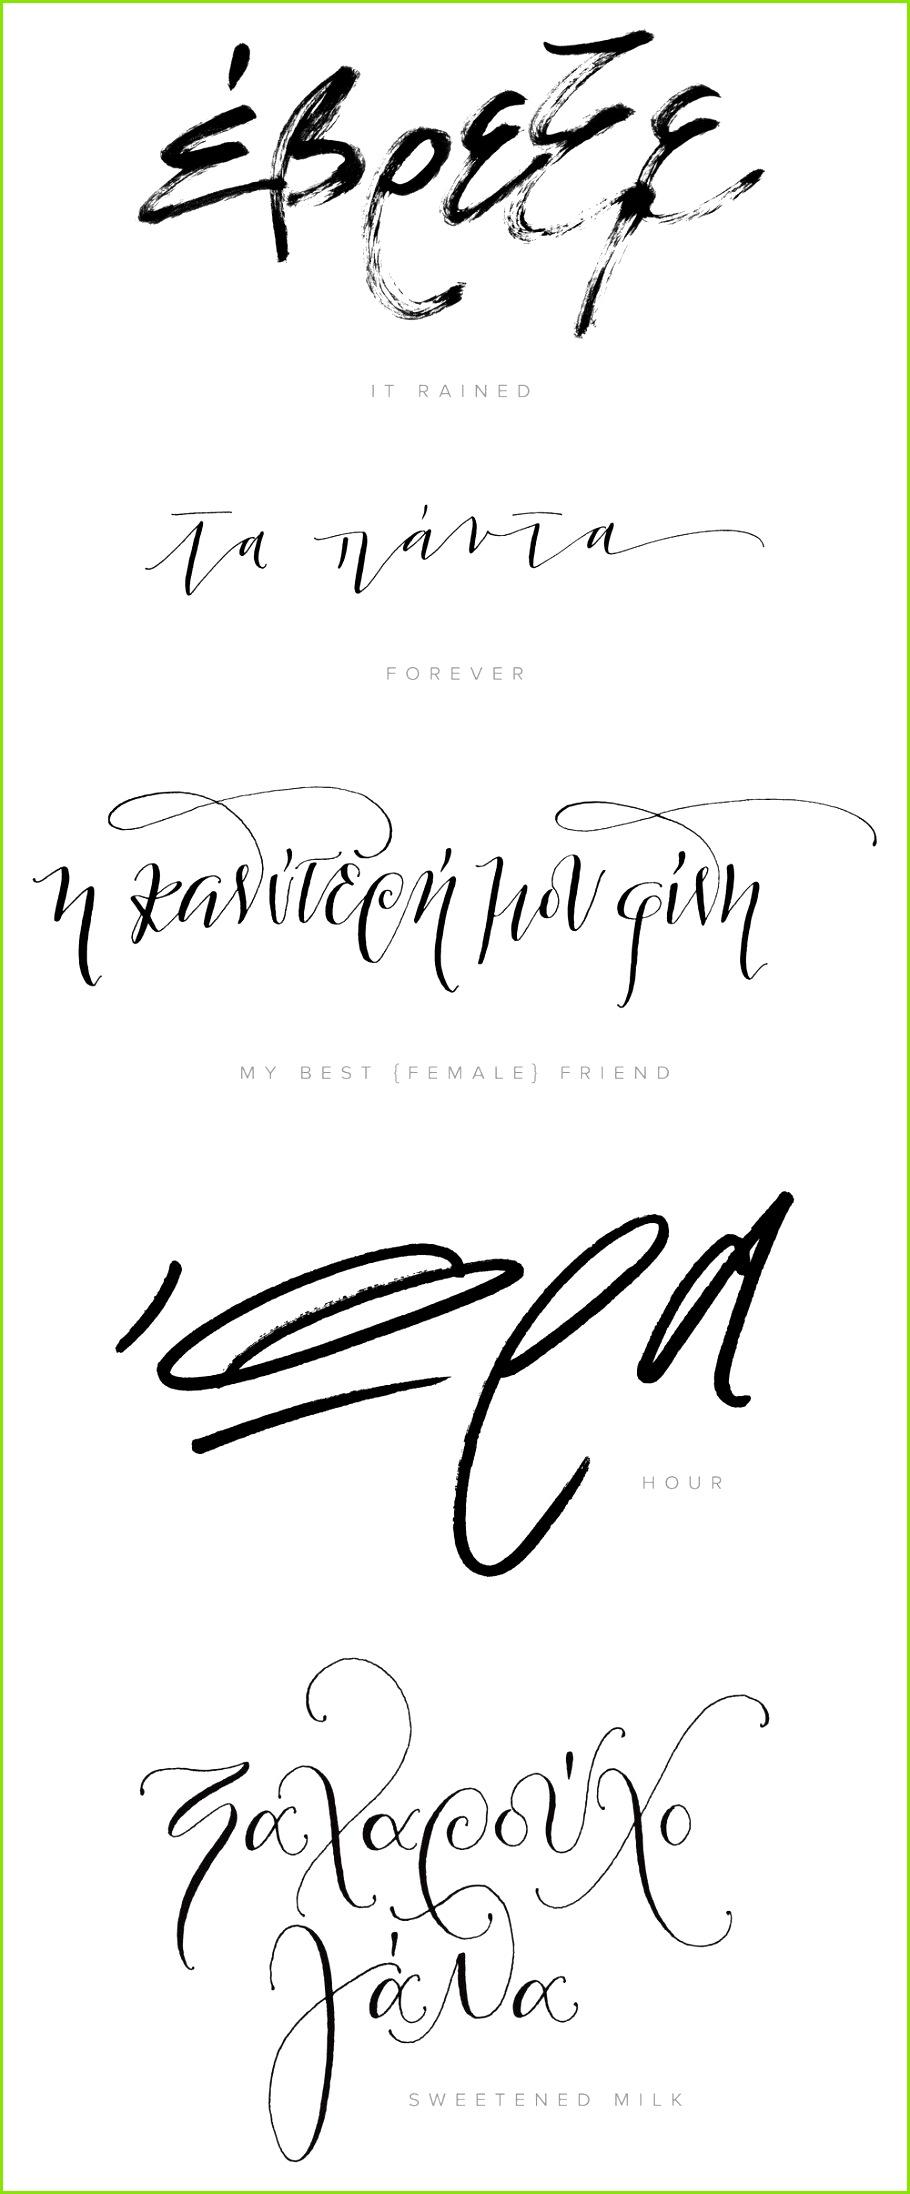 Modern Greek Calligraphy by Molly Suber Thorpe of Plurabelle Calligraphy Griechische Schrift Tattoos Buchstaben